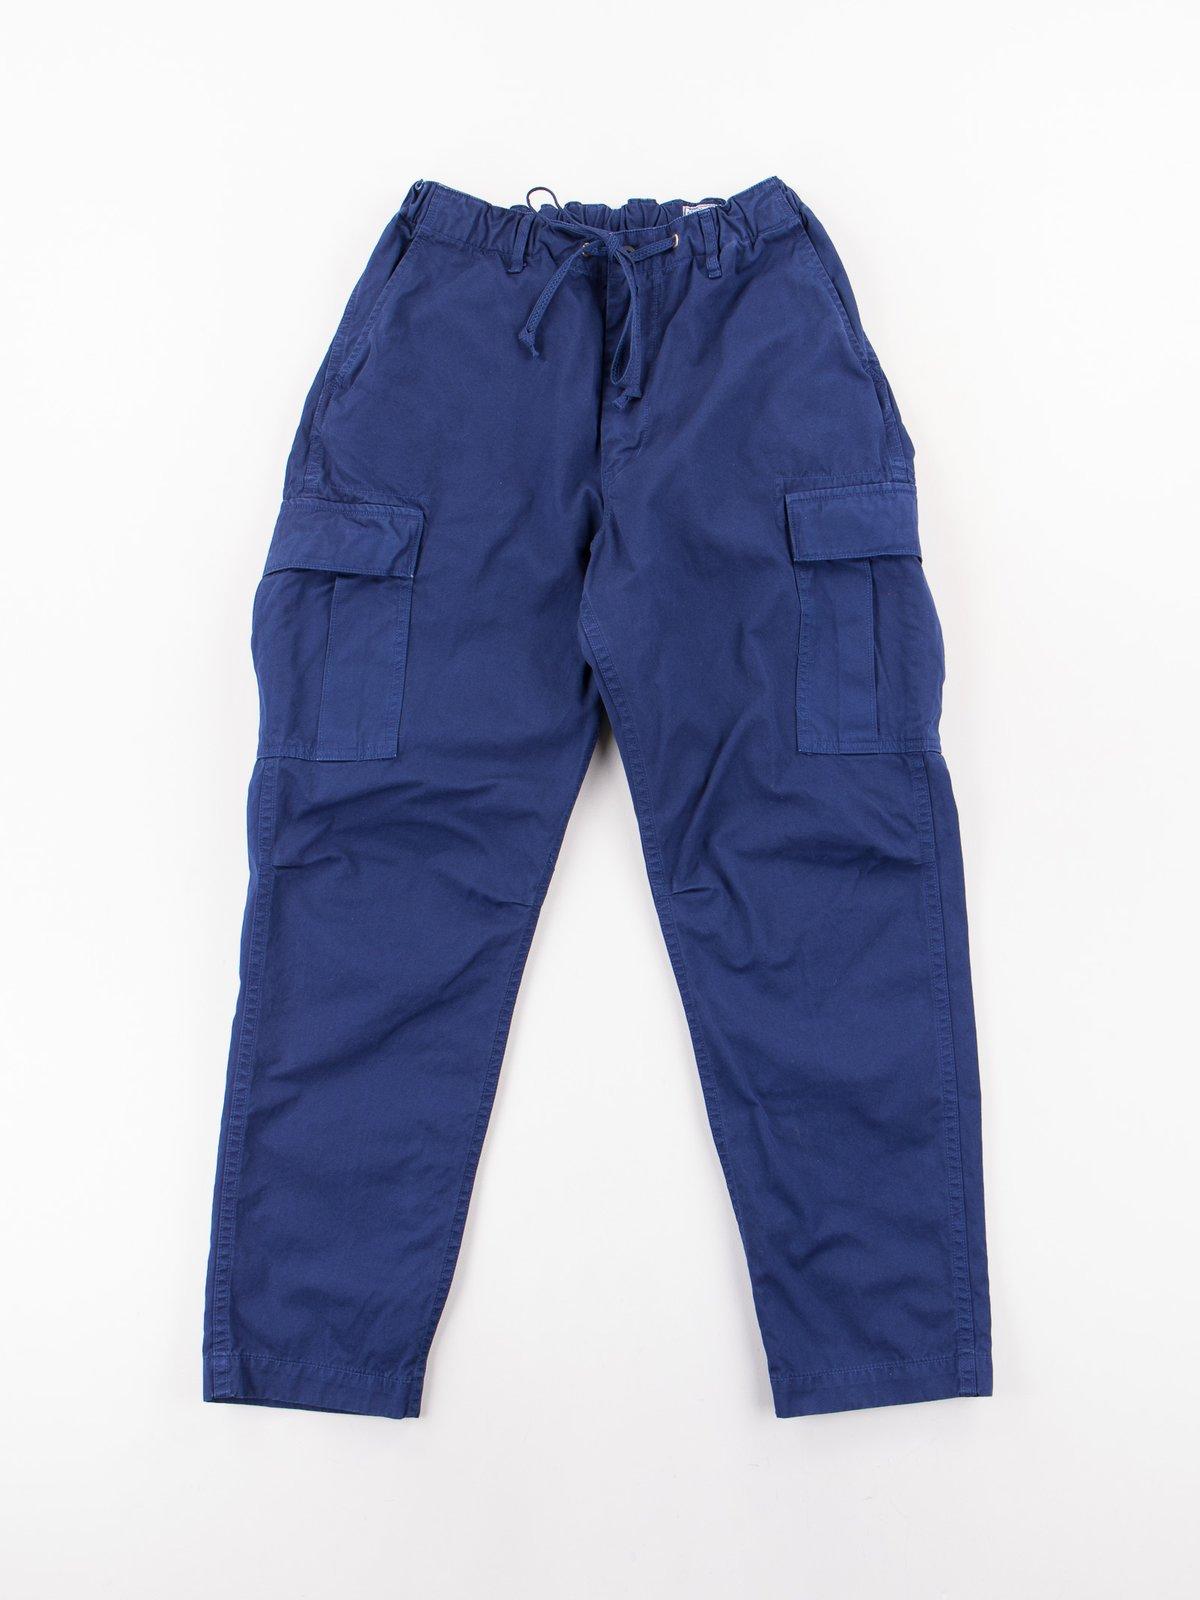 Ink Blue Poplin Easy Cargo Pant - Image 1